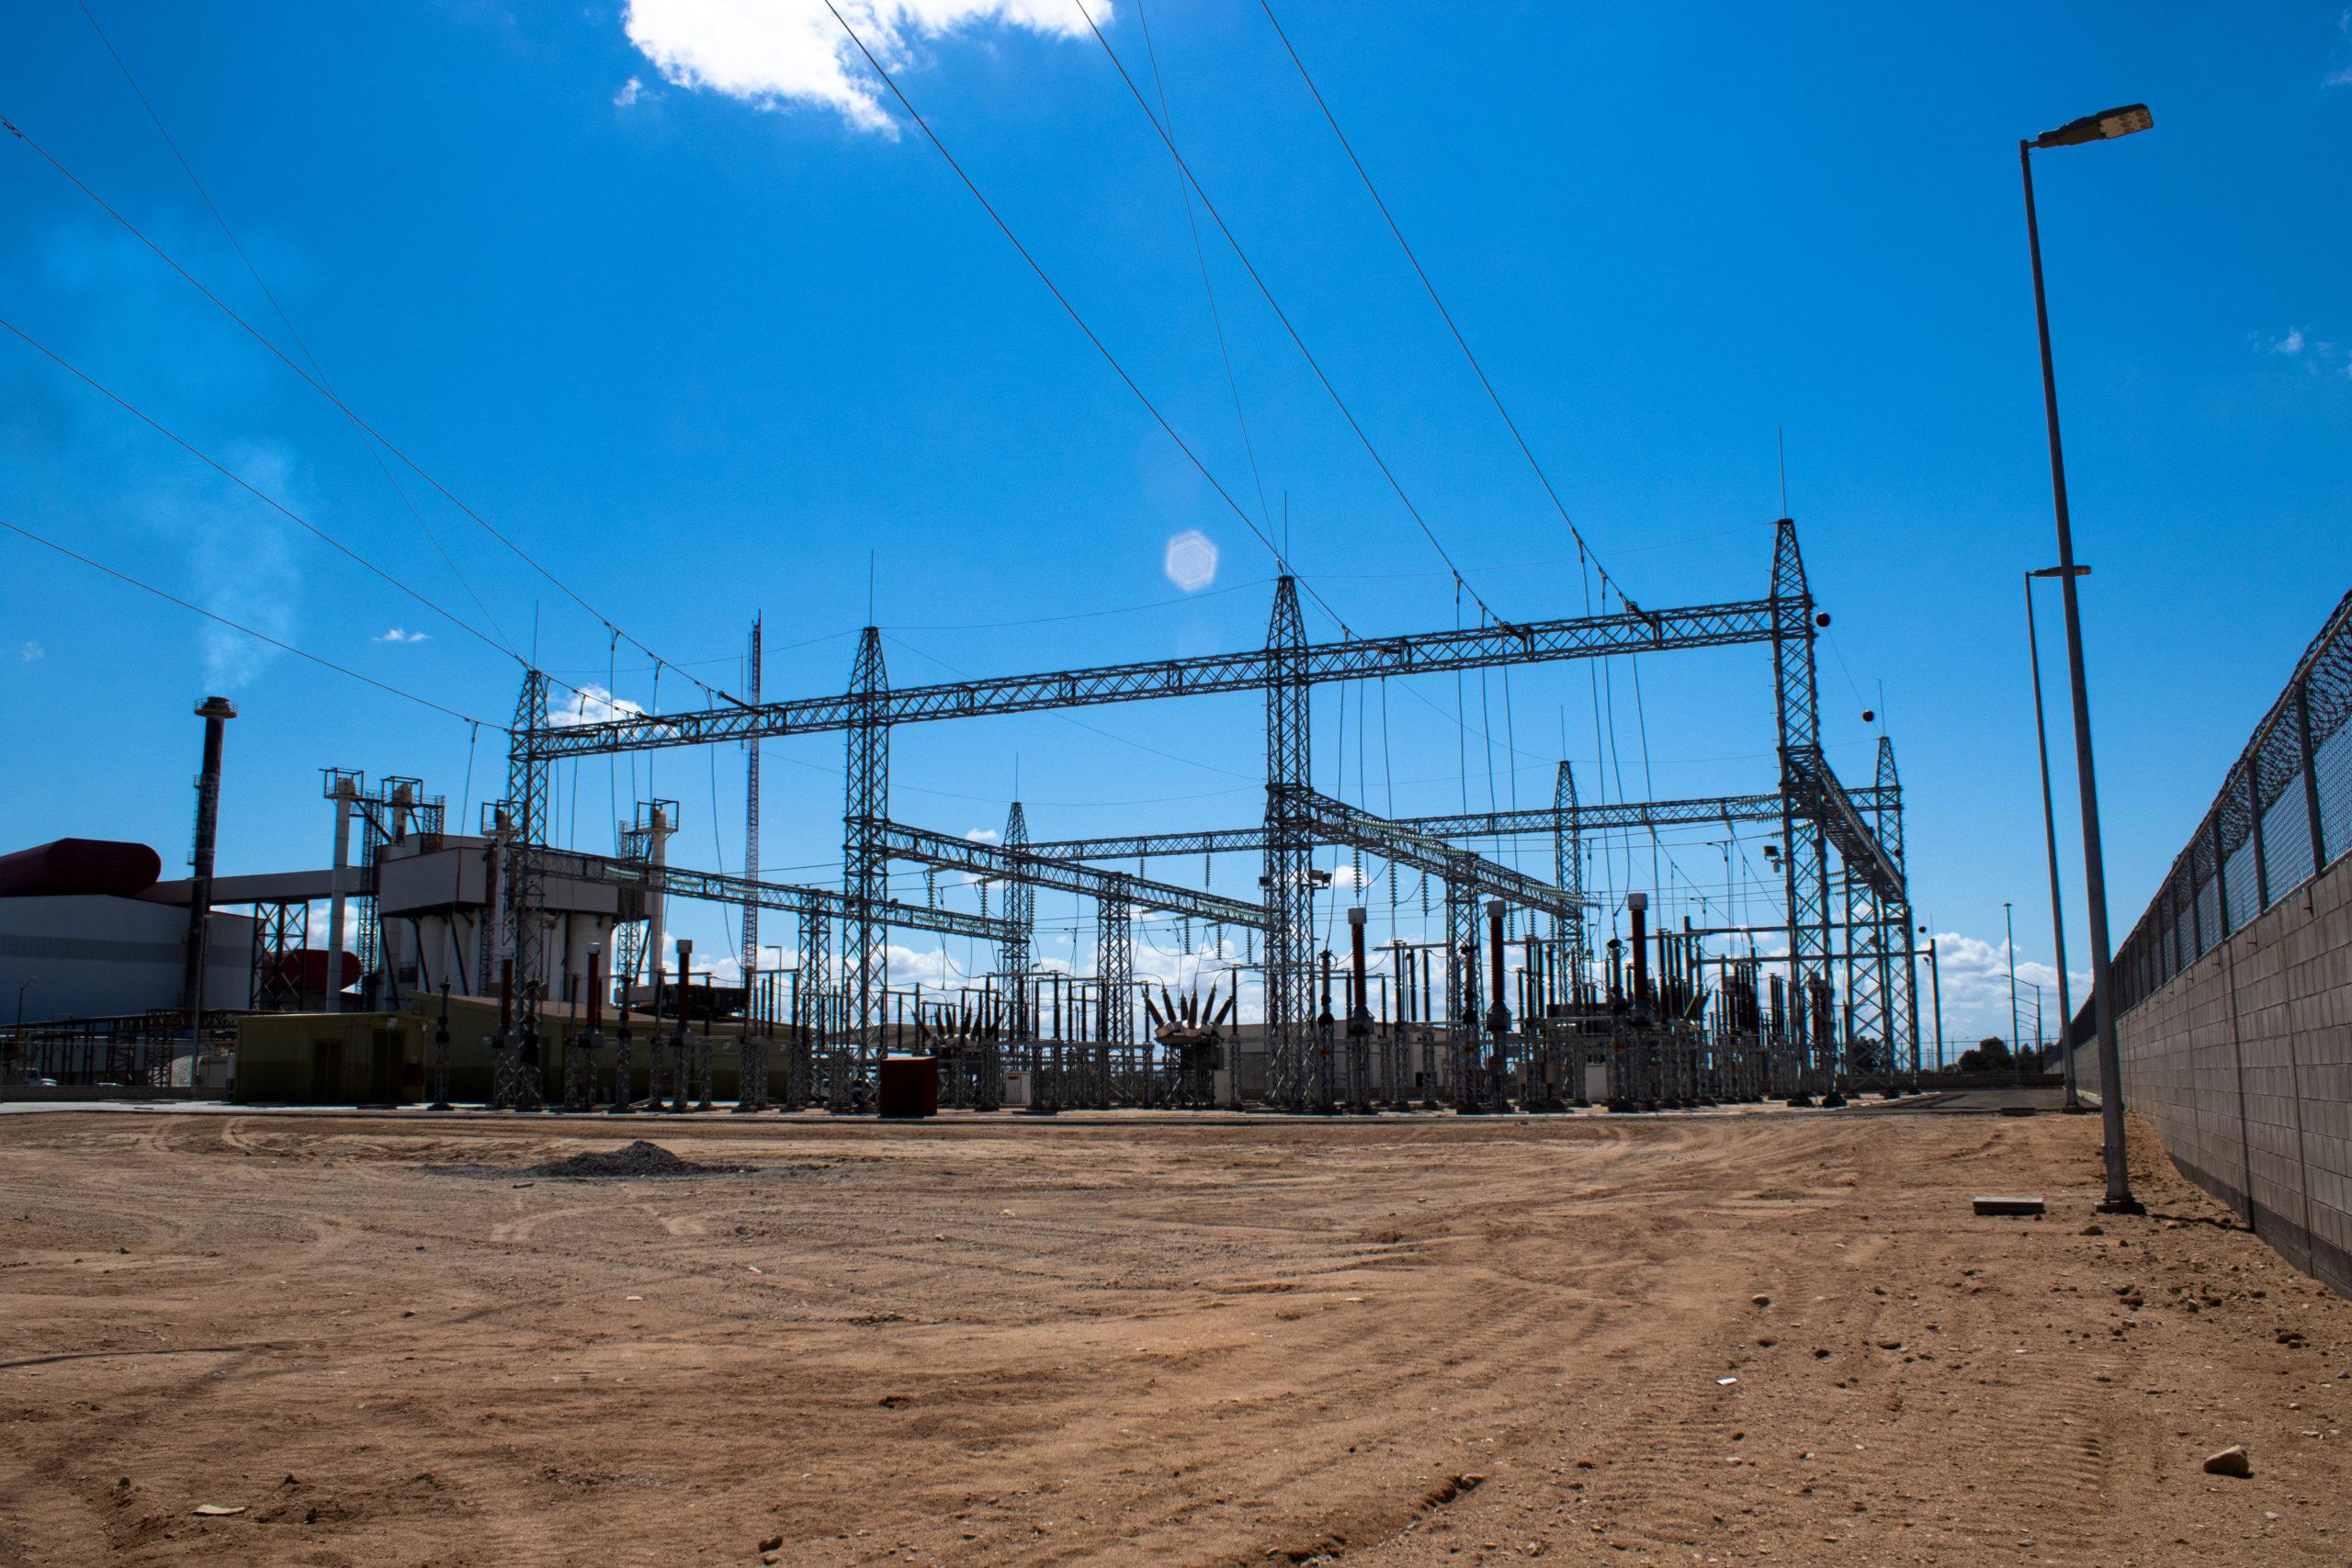 Subestacion de electrica